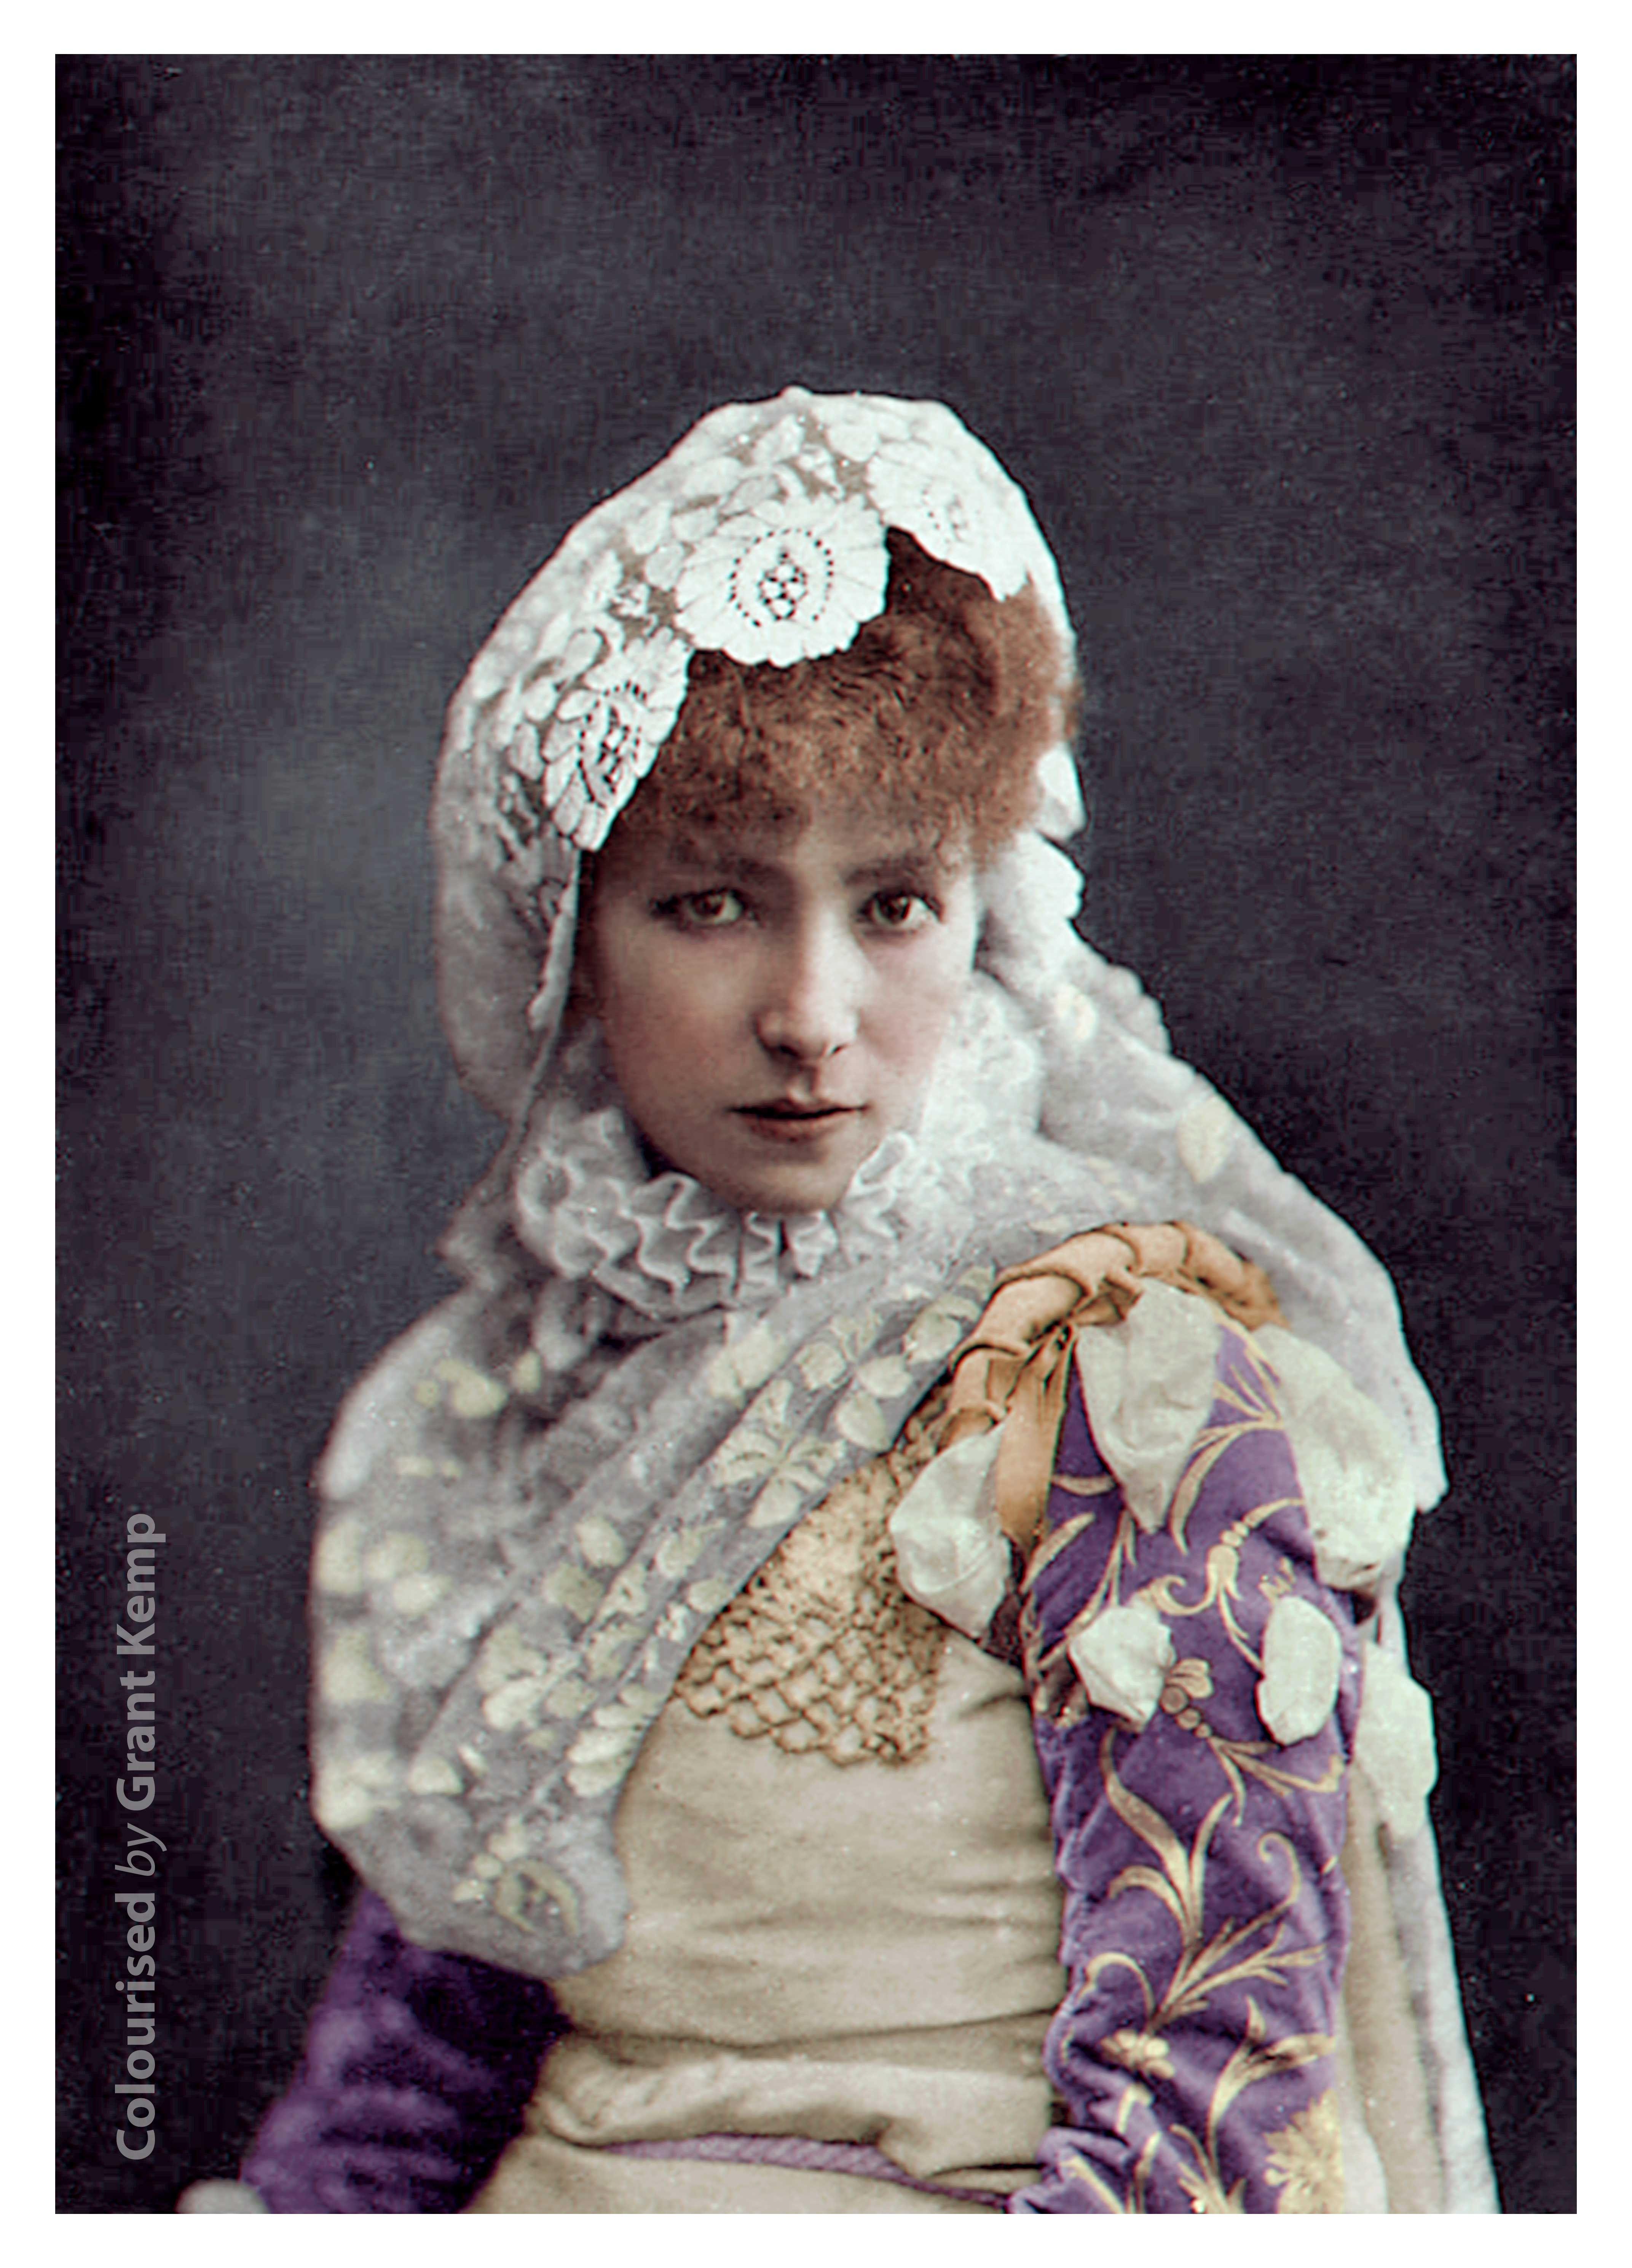 Sarah Bernhardt As Dona Sol In Hernani 1878 Hernani Photo Restoration White Picture